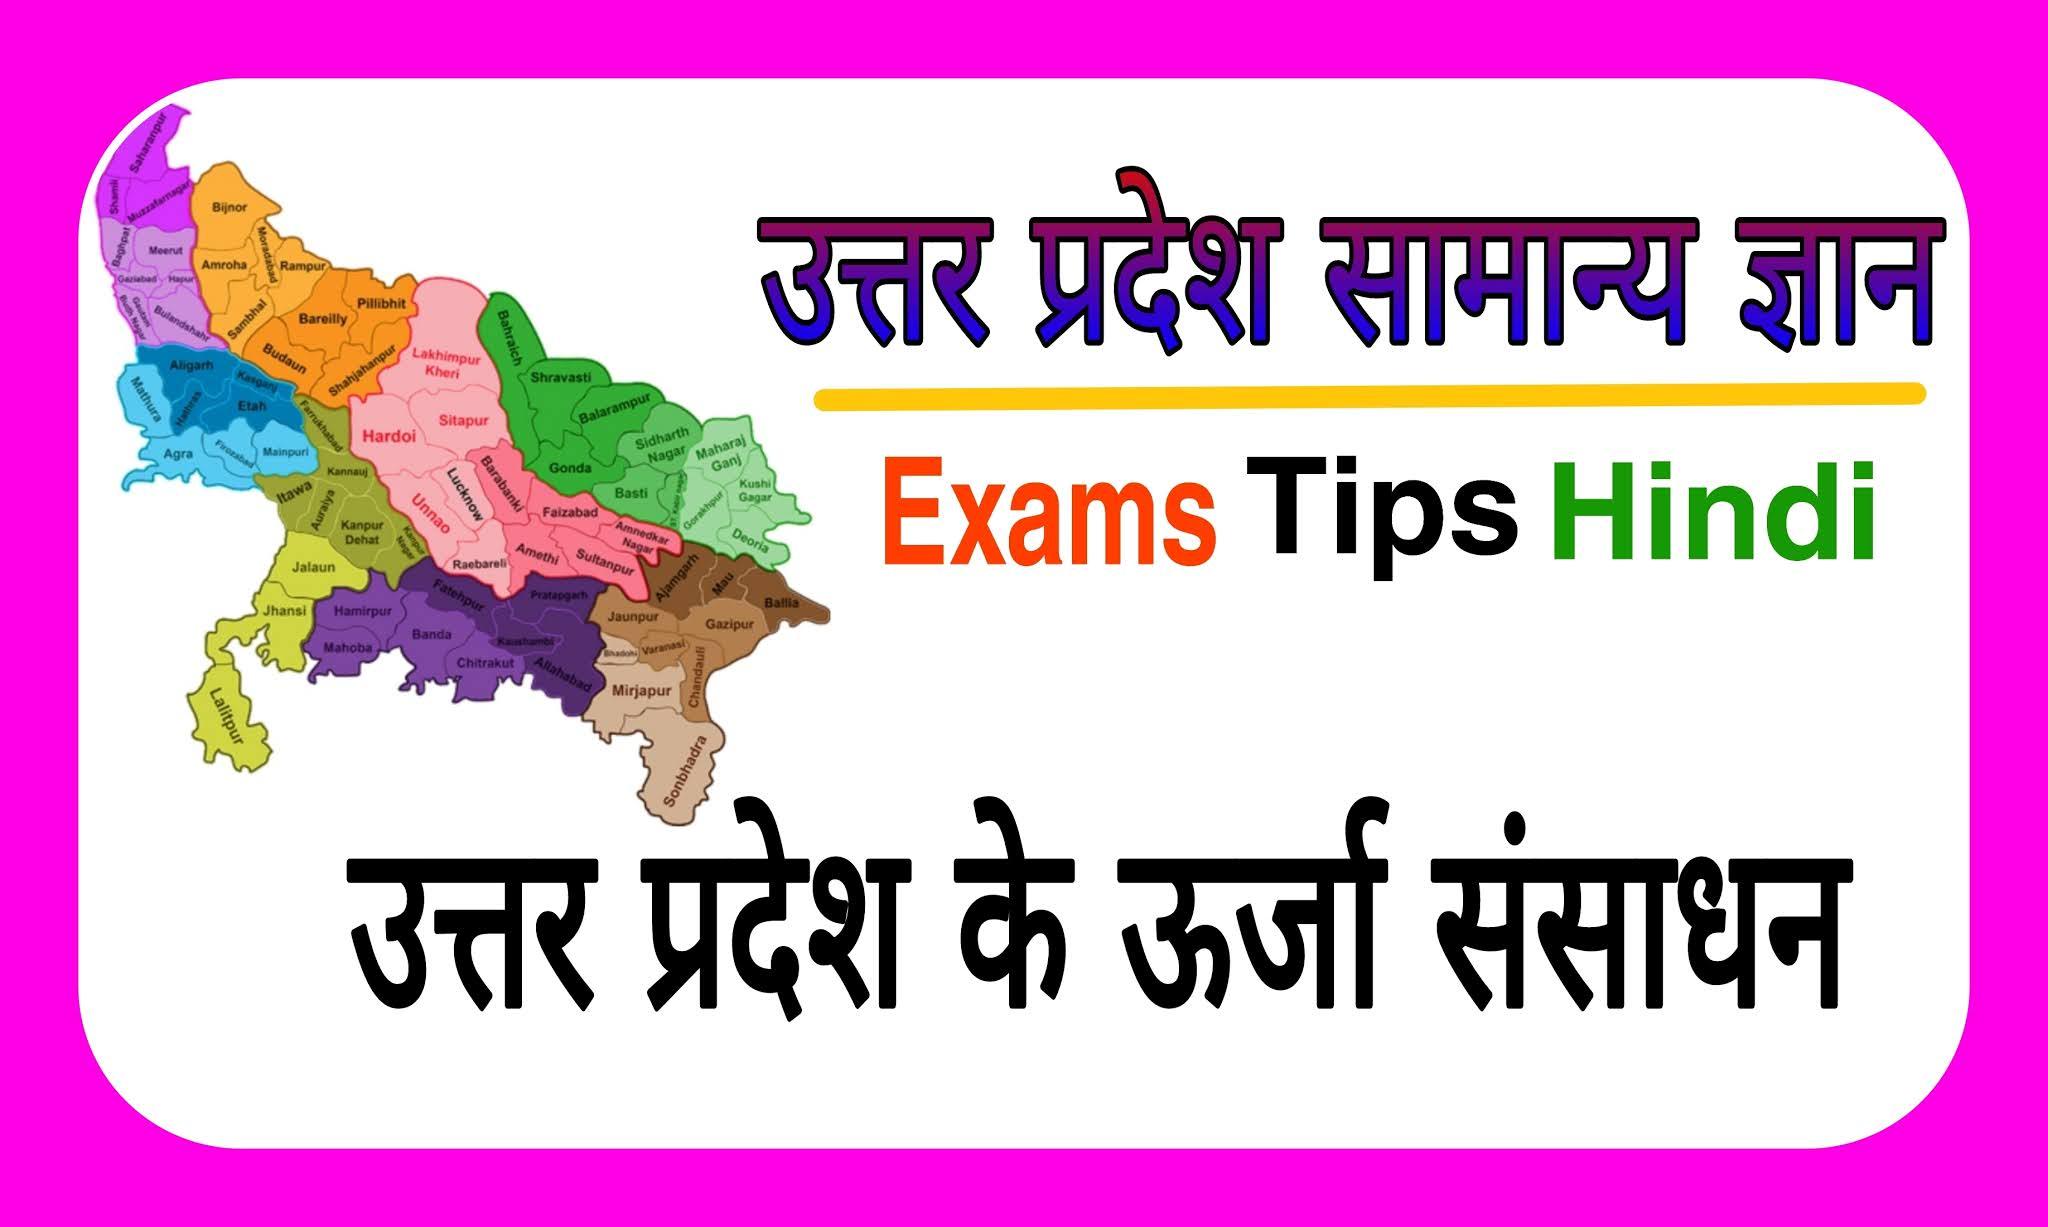 UP Energy Resources GK in Hindi, UP Energy Resources gk in hindi, UP GK in Hindi, Uttar Pradesh ke Urja Sansadhan